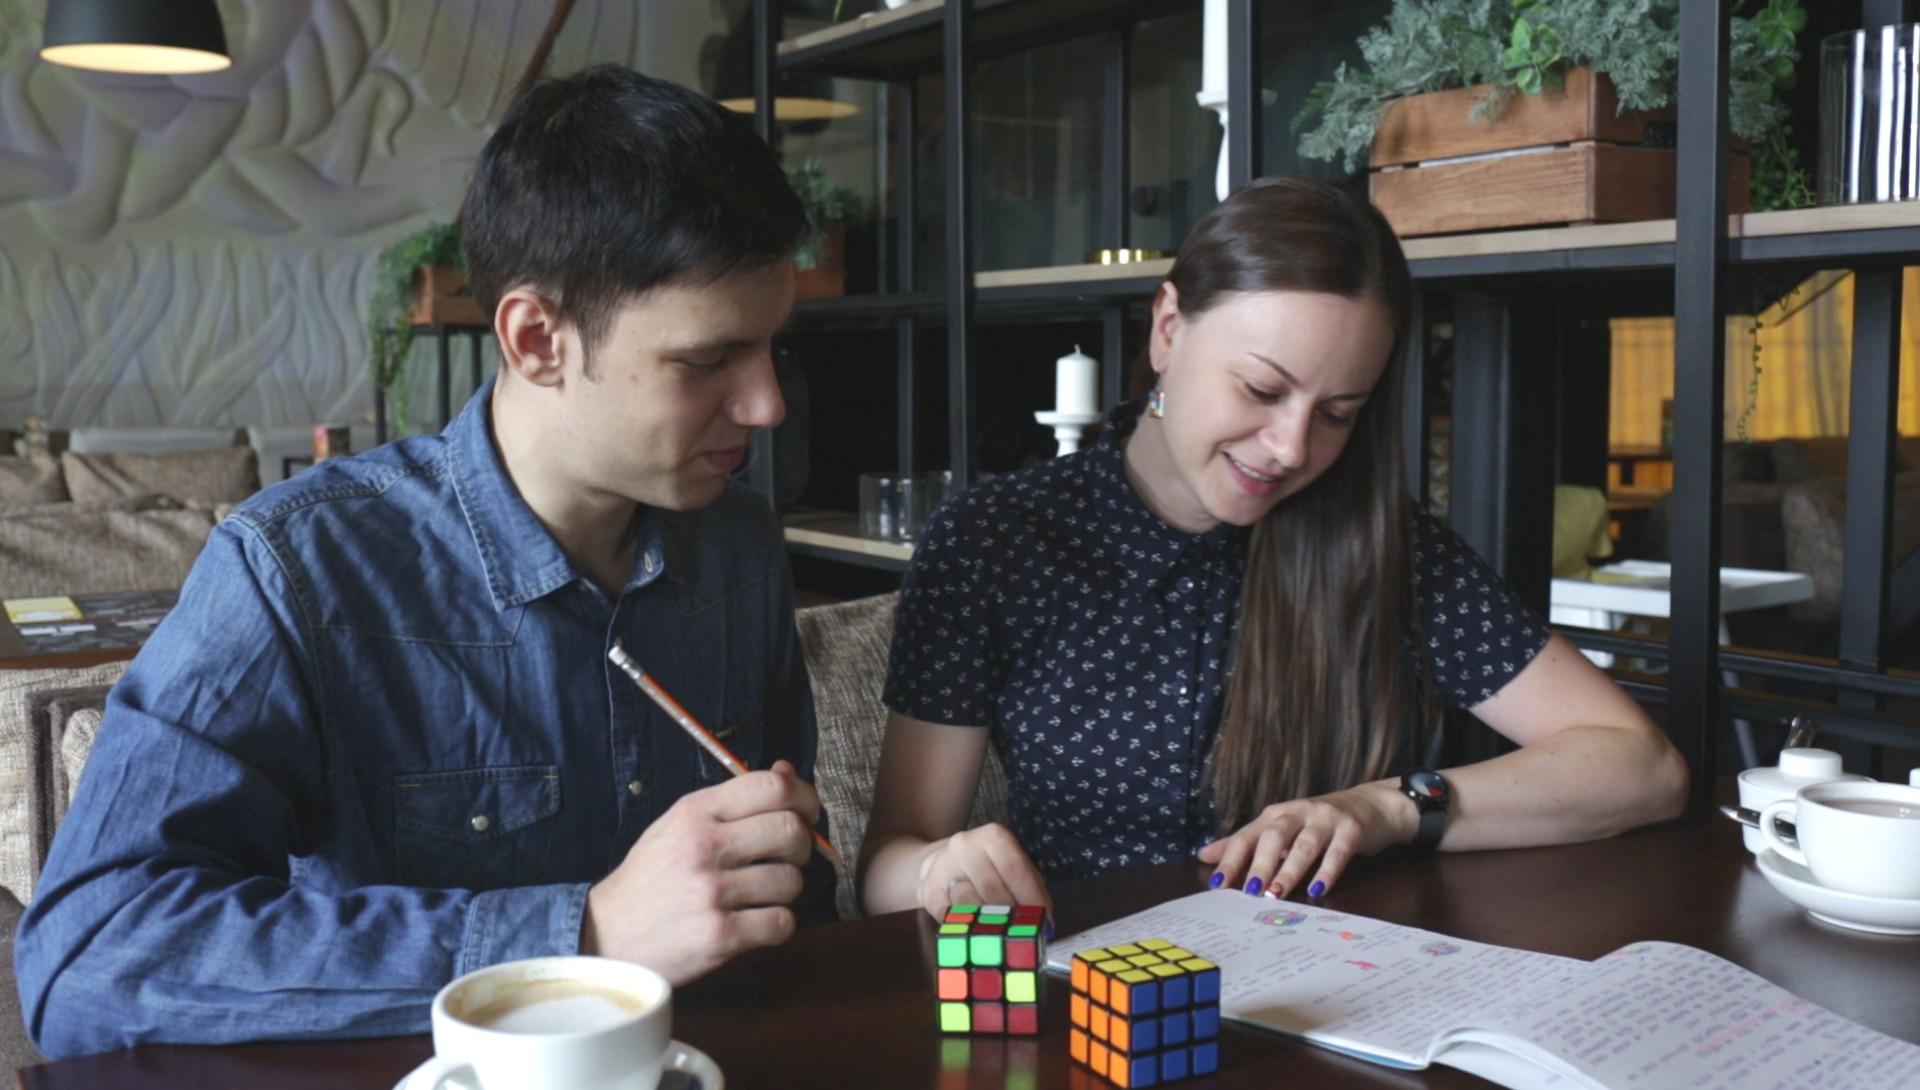 Роман Страхов и Диана Мурник выпустили книгу про кубик Рубика